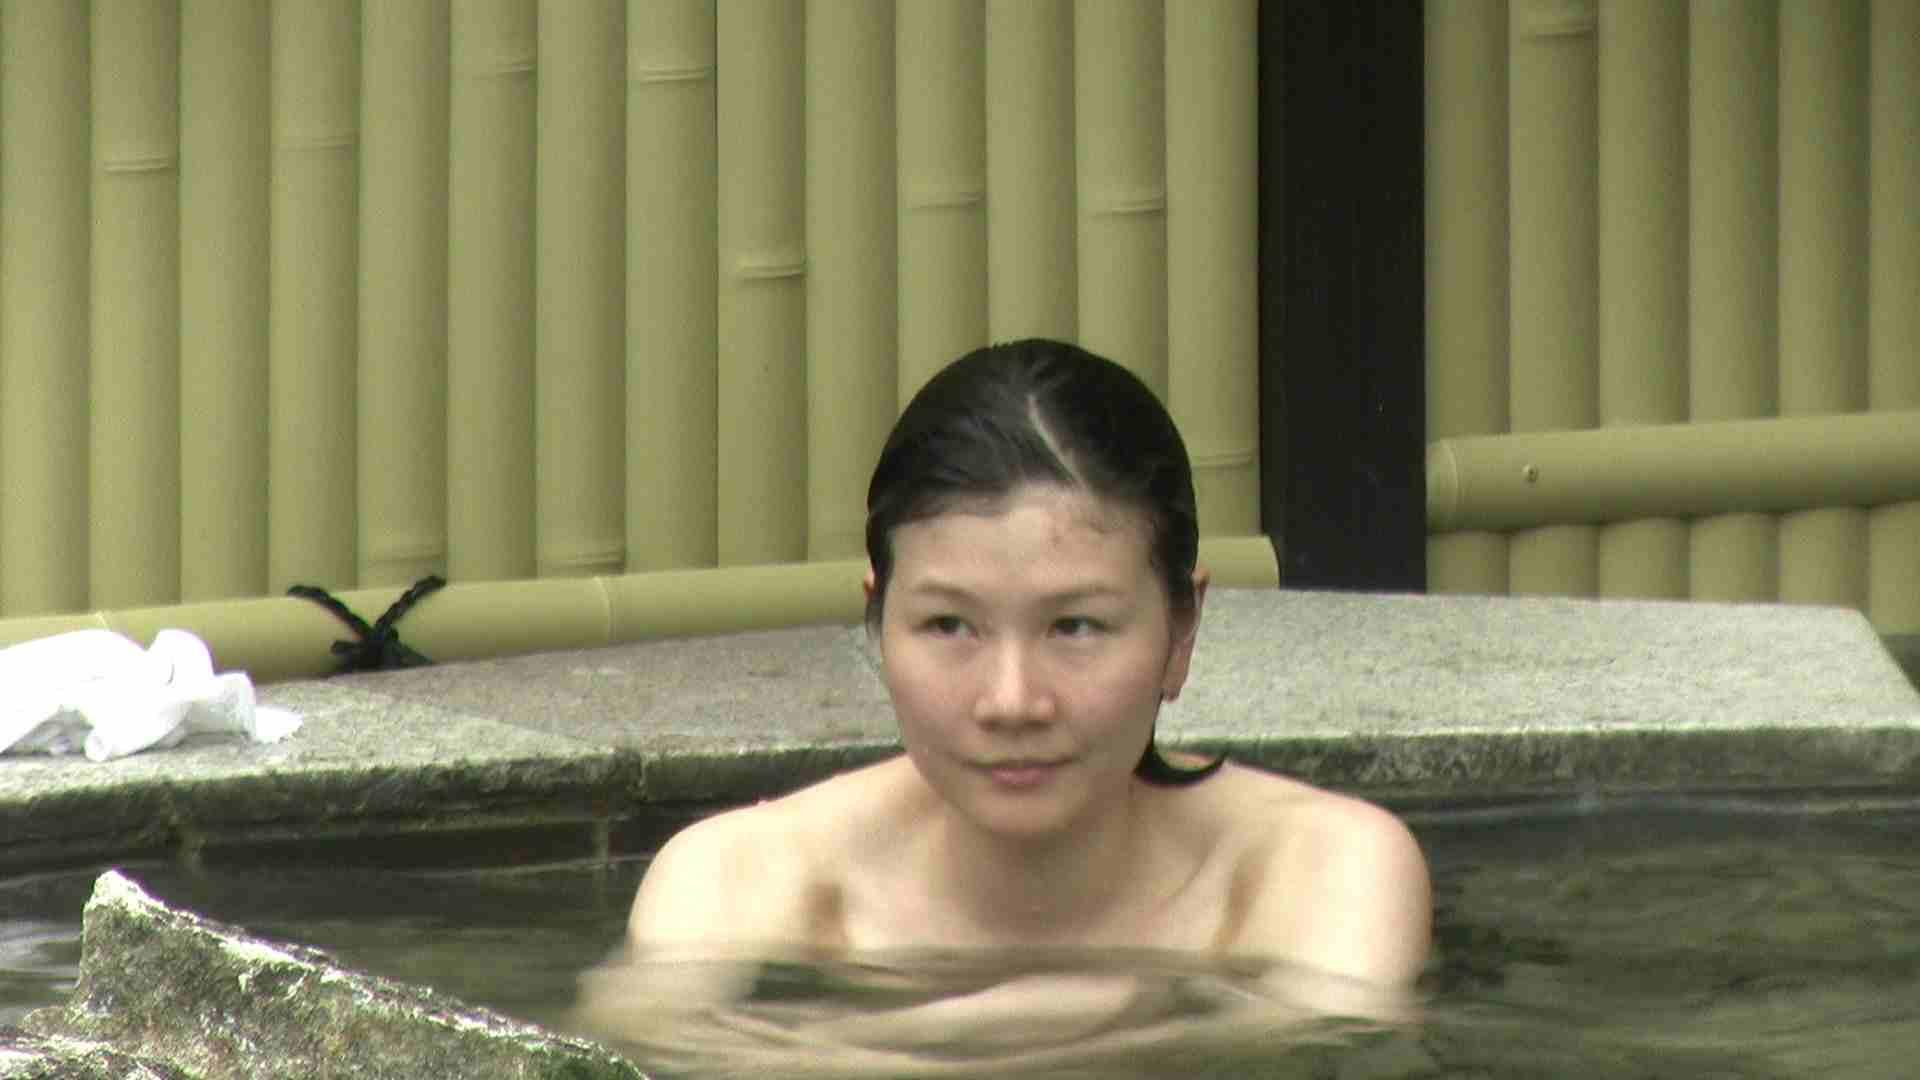 Aquaな露天風呂Vol.187 盗撮   HなOL  96pic 14